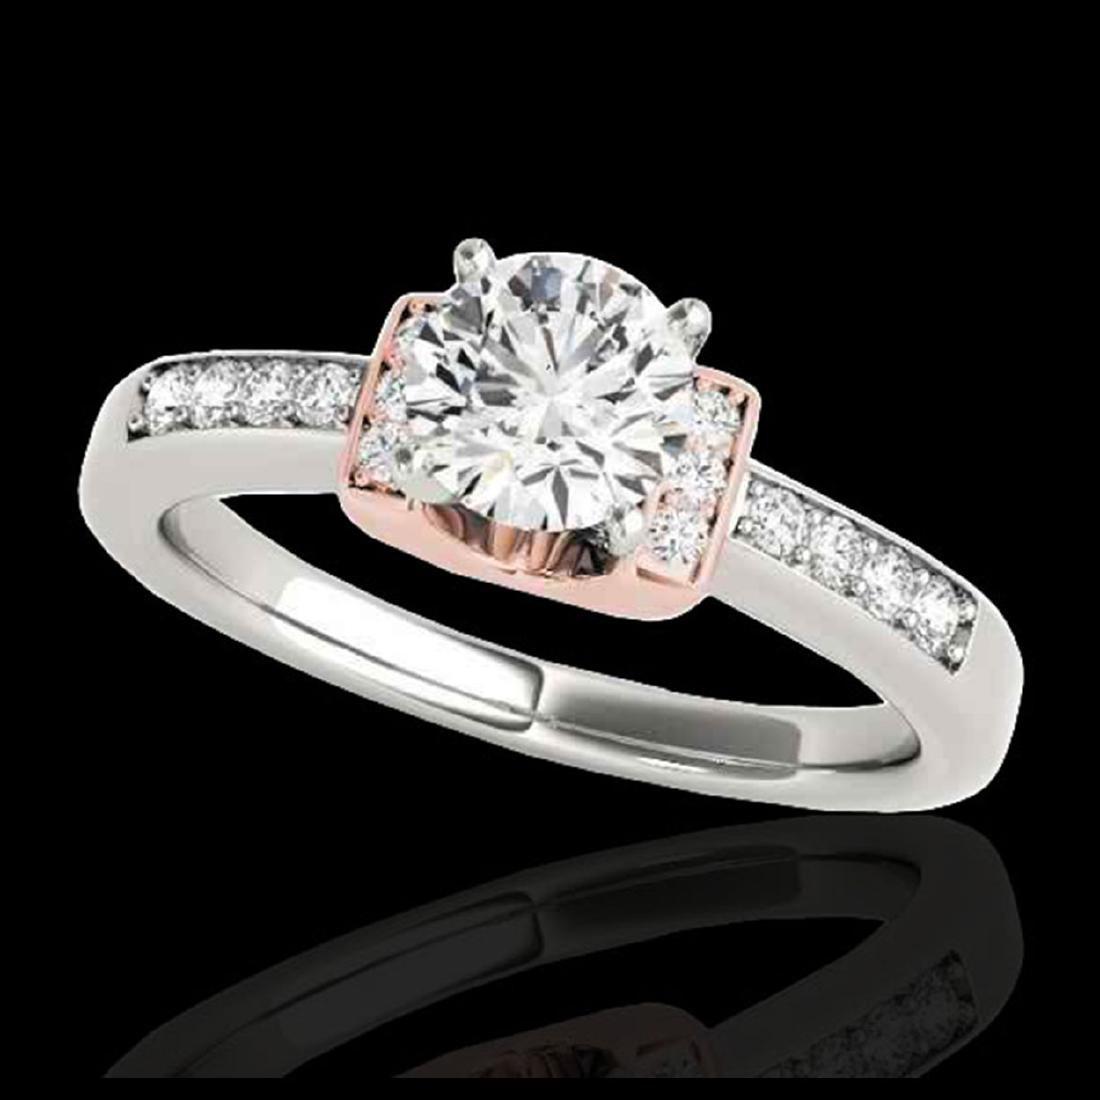 1.11 ctw H-SI/I Diamond Solitaire Ring 10K White & Rose